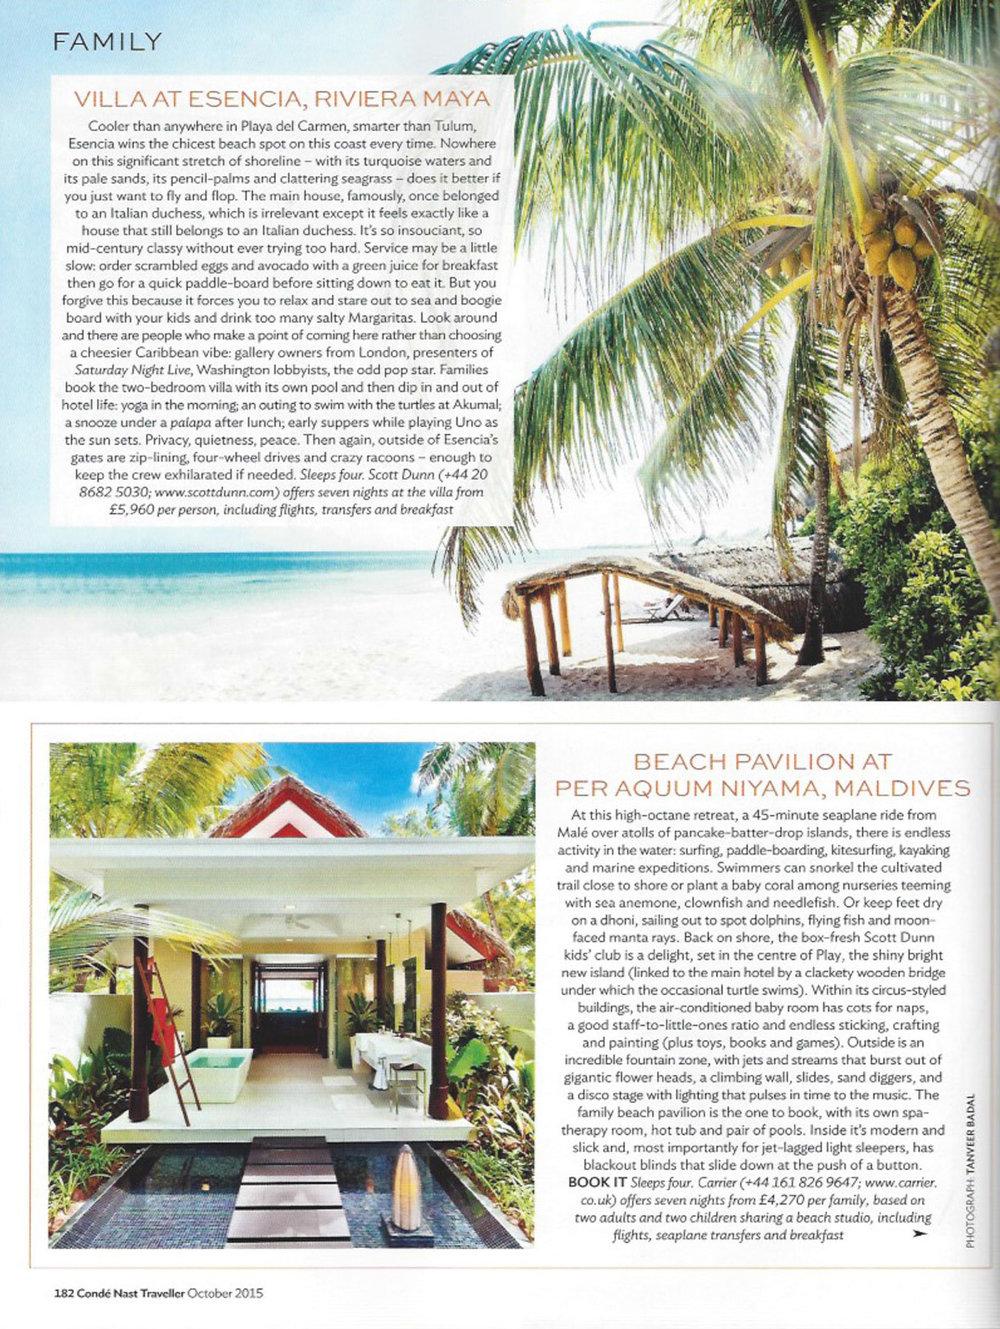 Condé Nast Traveller (UK) Magazine